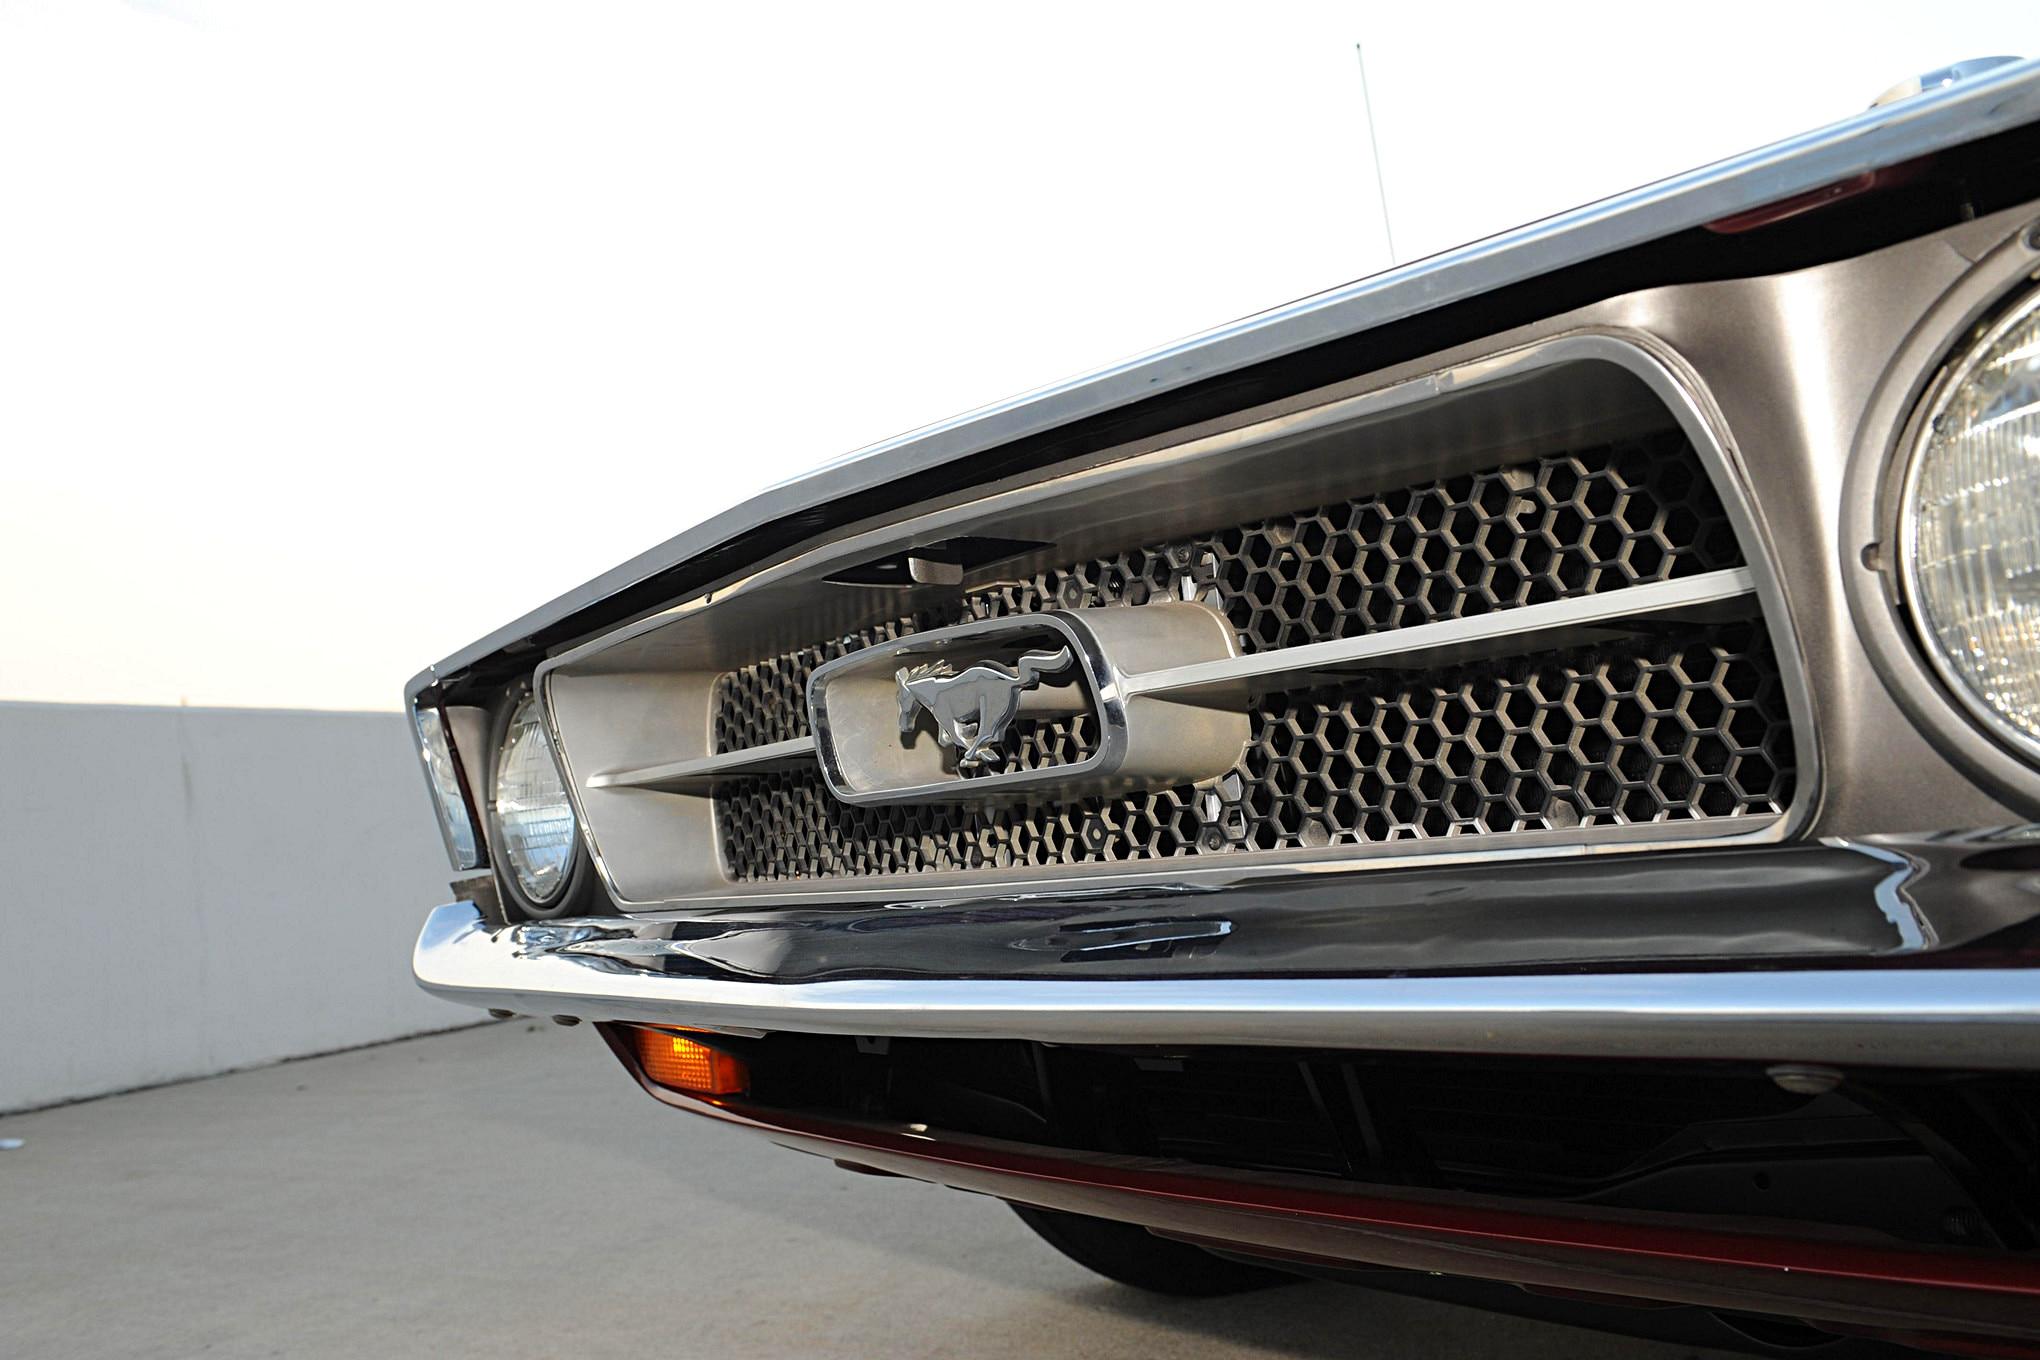 002 1971 73 Mustang SpottersGuide Heasley